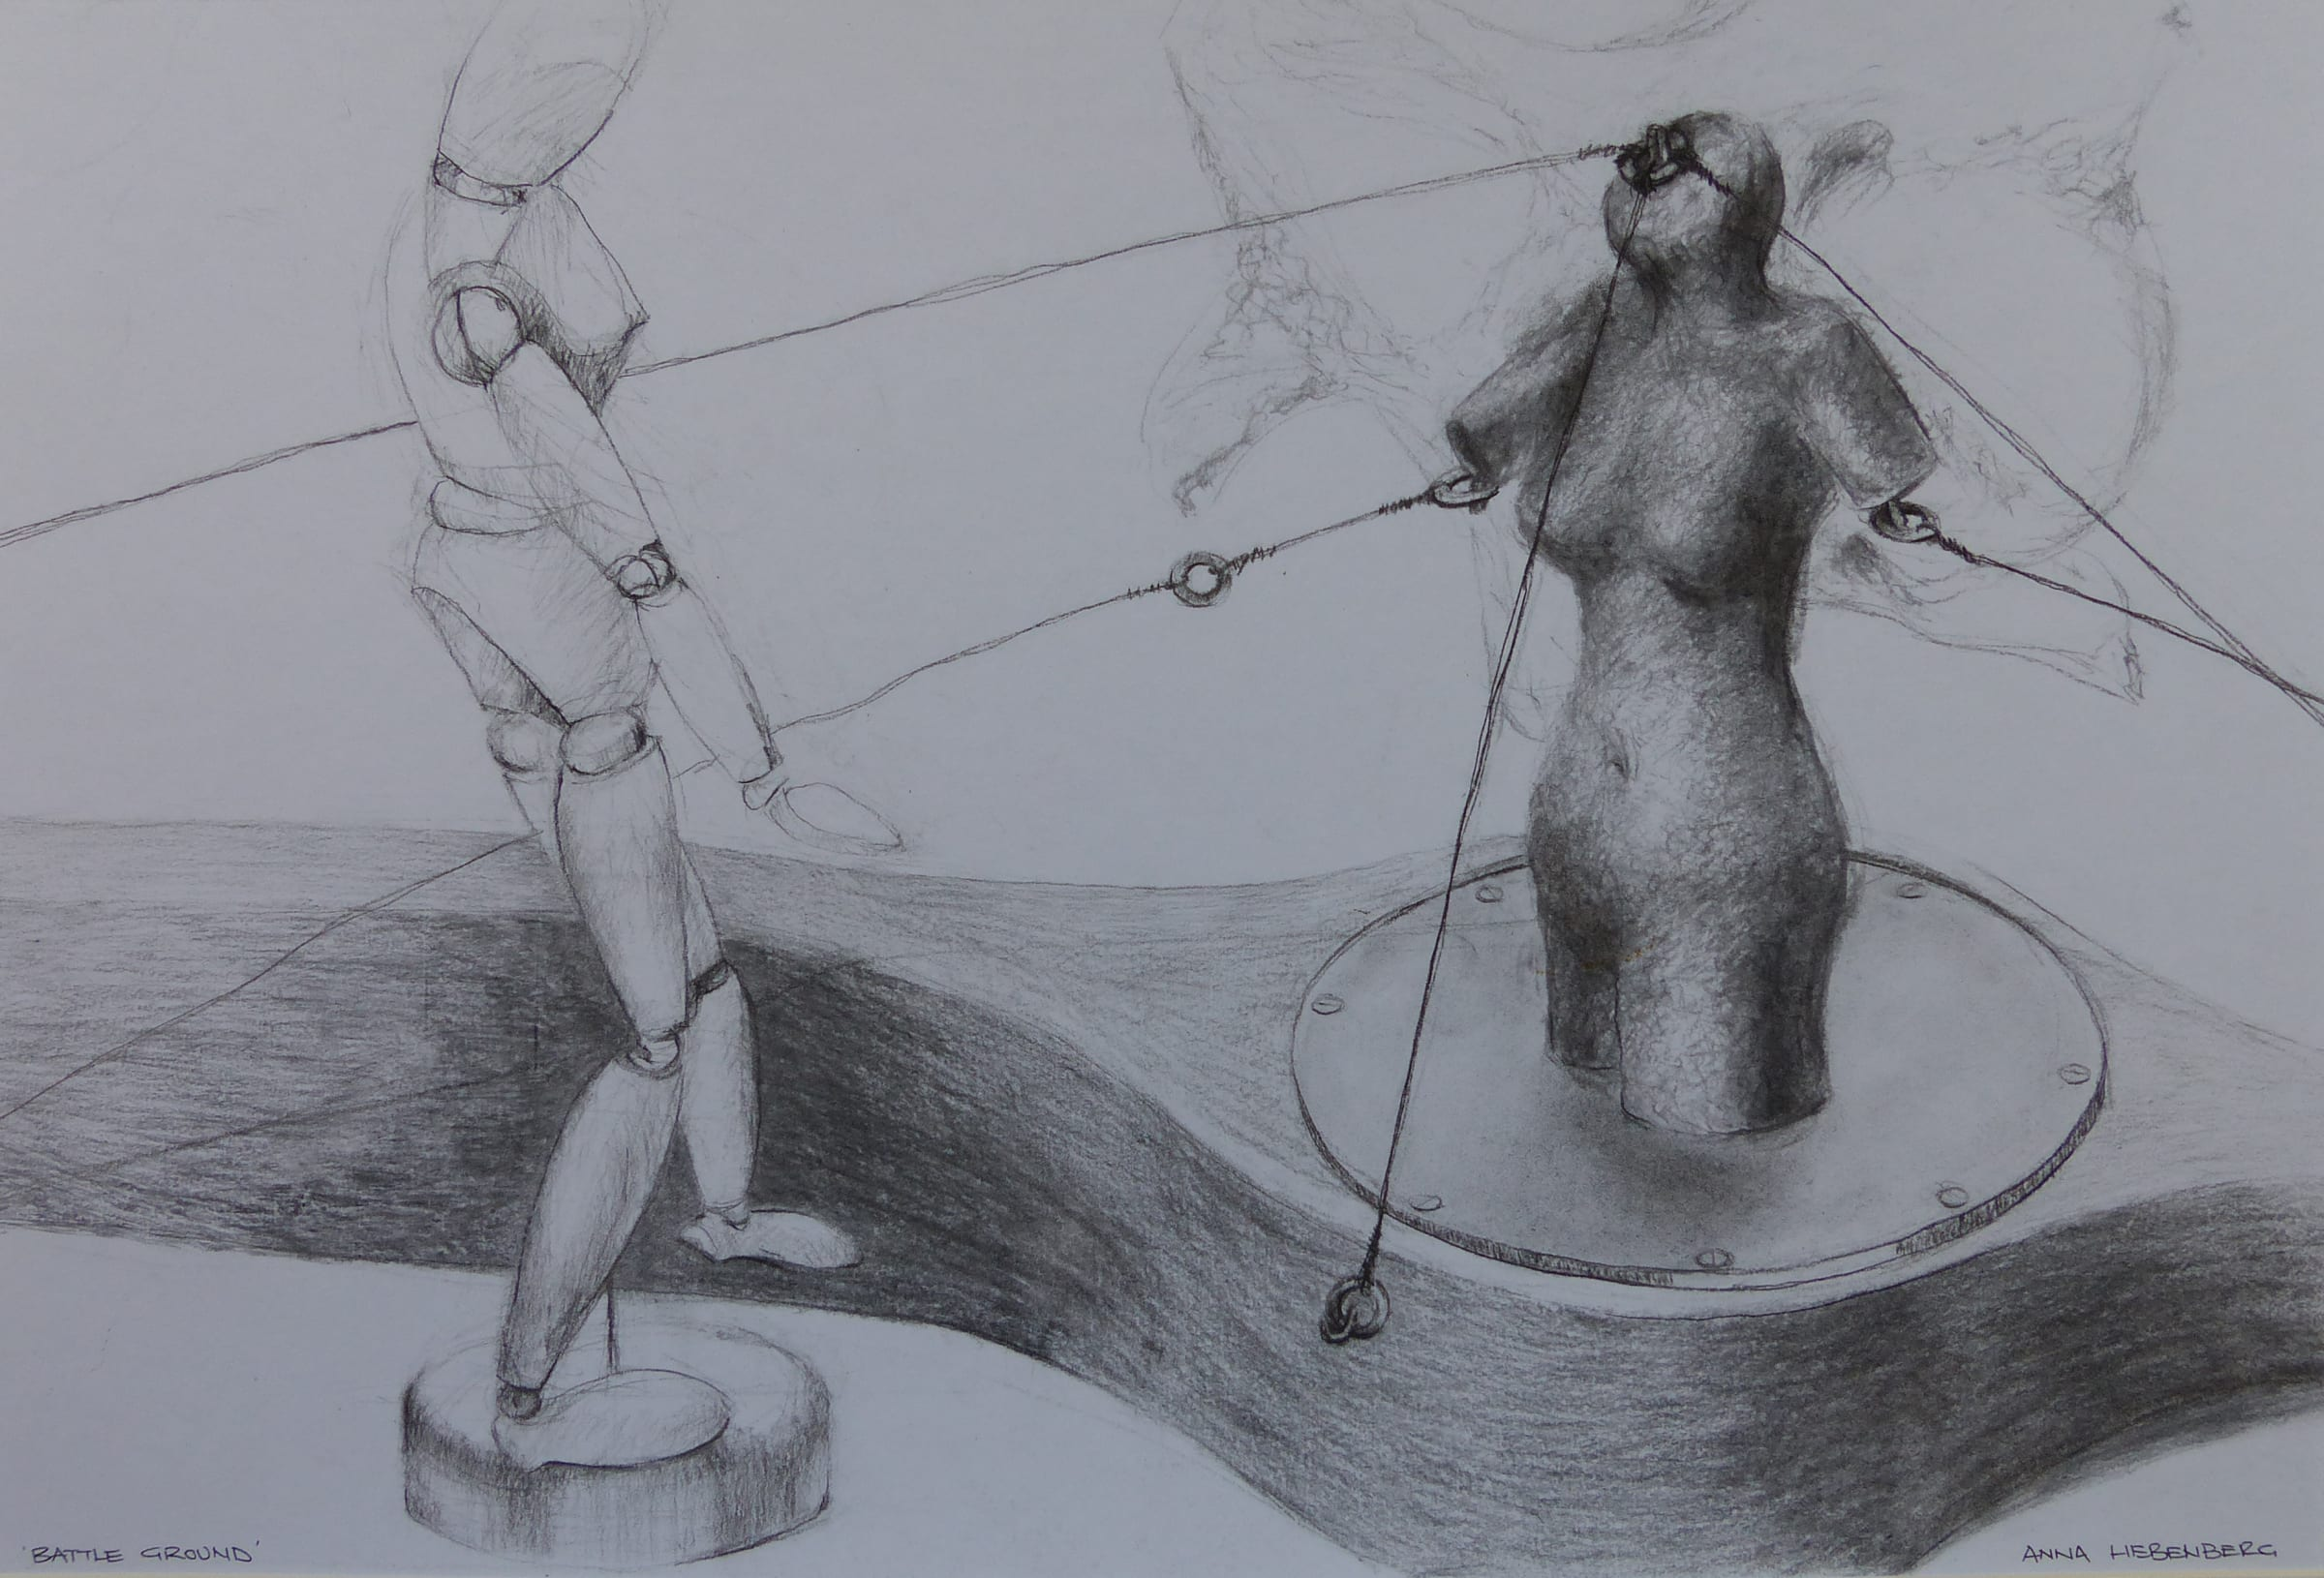 <span class=&#34;link fancybox-details-link&#34;><a href=&#34;/artists/57-anna-liebenberg/works/991-anna-liebenberg-battleground-2015/&#34;>View Detail Page</a></span><div class=&#34;artist&#34;><strong>Anna Liebenberg</strong></div> <div class=&#34;title&#34;><em>Battleground</em>, 2015</div> <div class=&#34;medium&#34;>Charcoal on Cartridge</div> <div class=&#34;dimensions&#34;>38cm x 56cm</div><div class=&#34;price&#34;>R4,200.00</div>